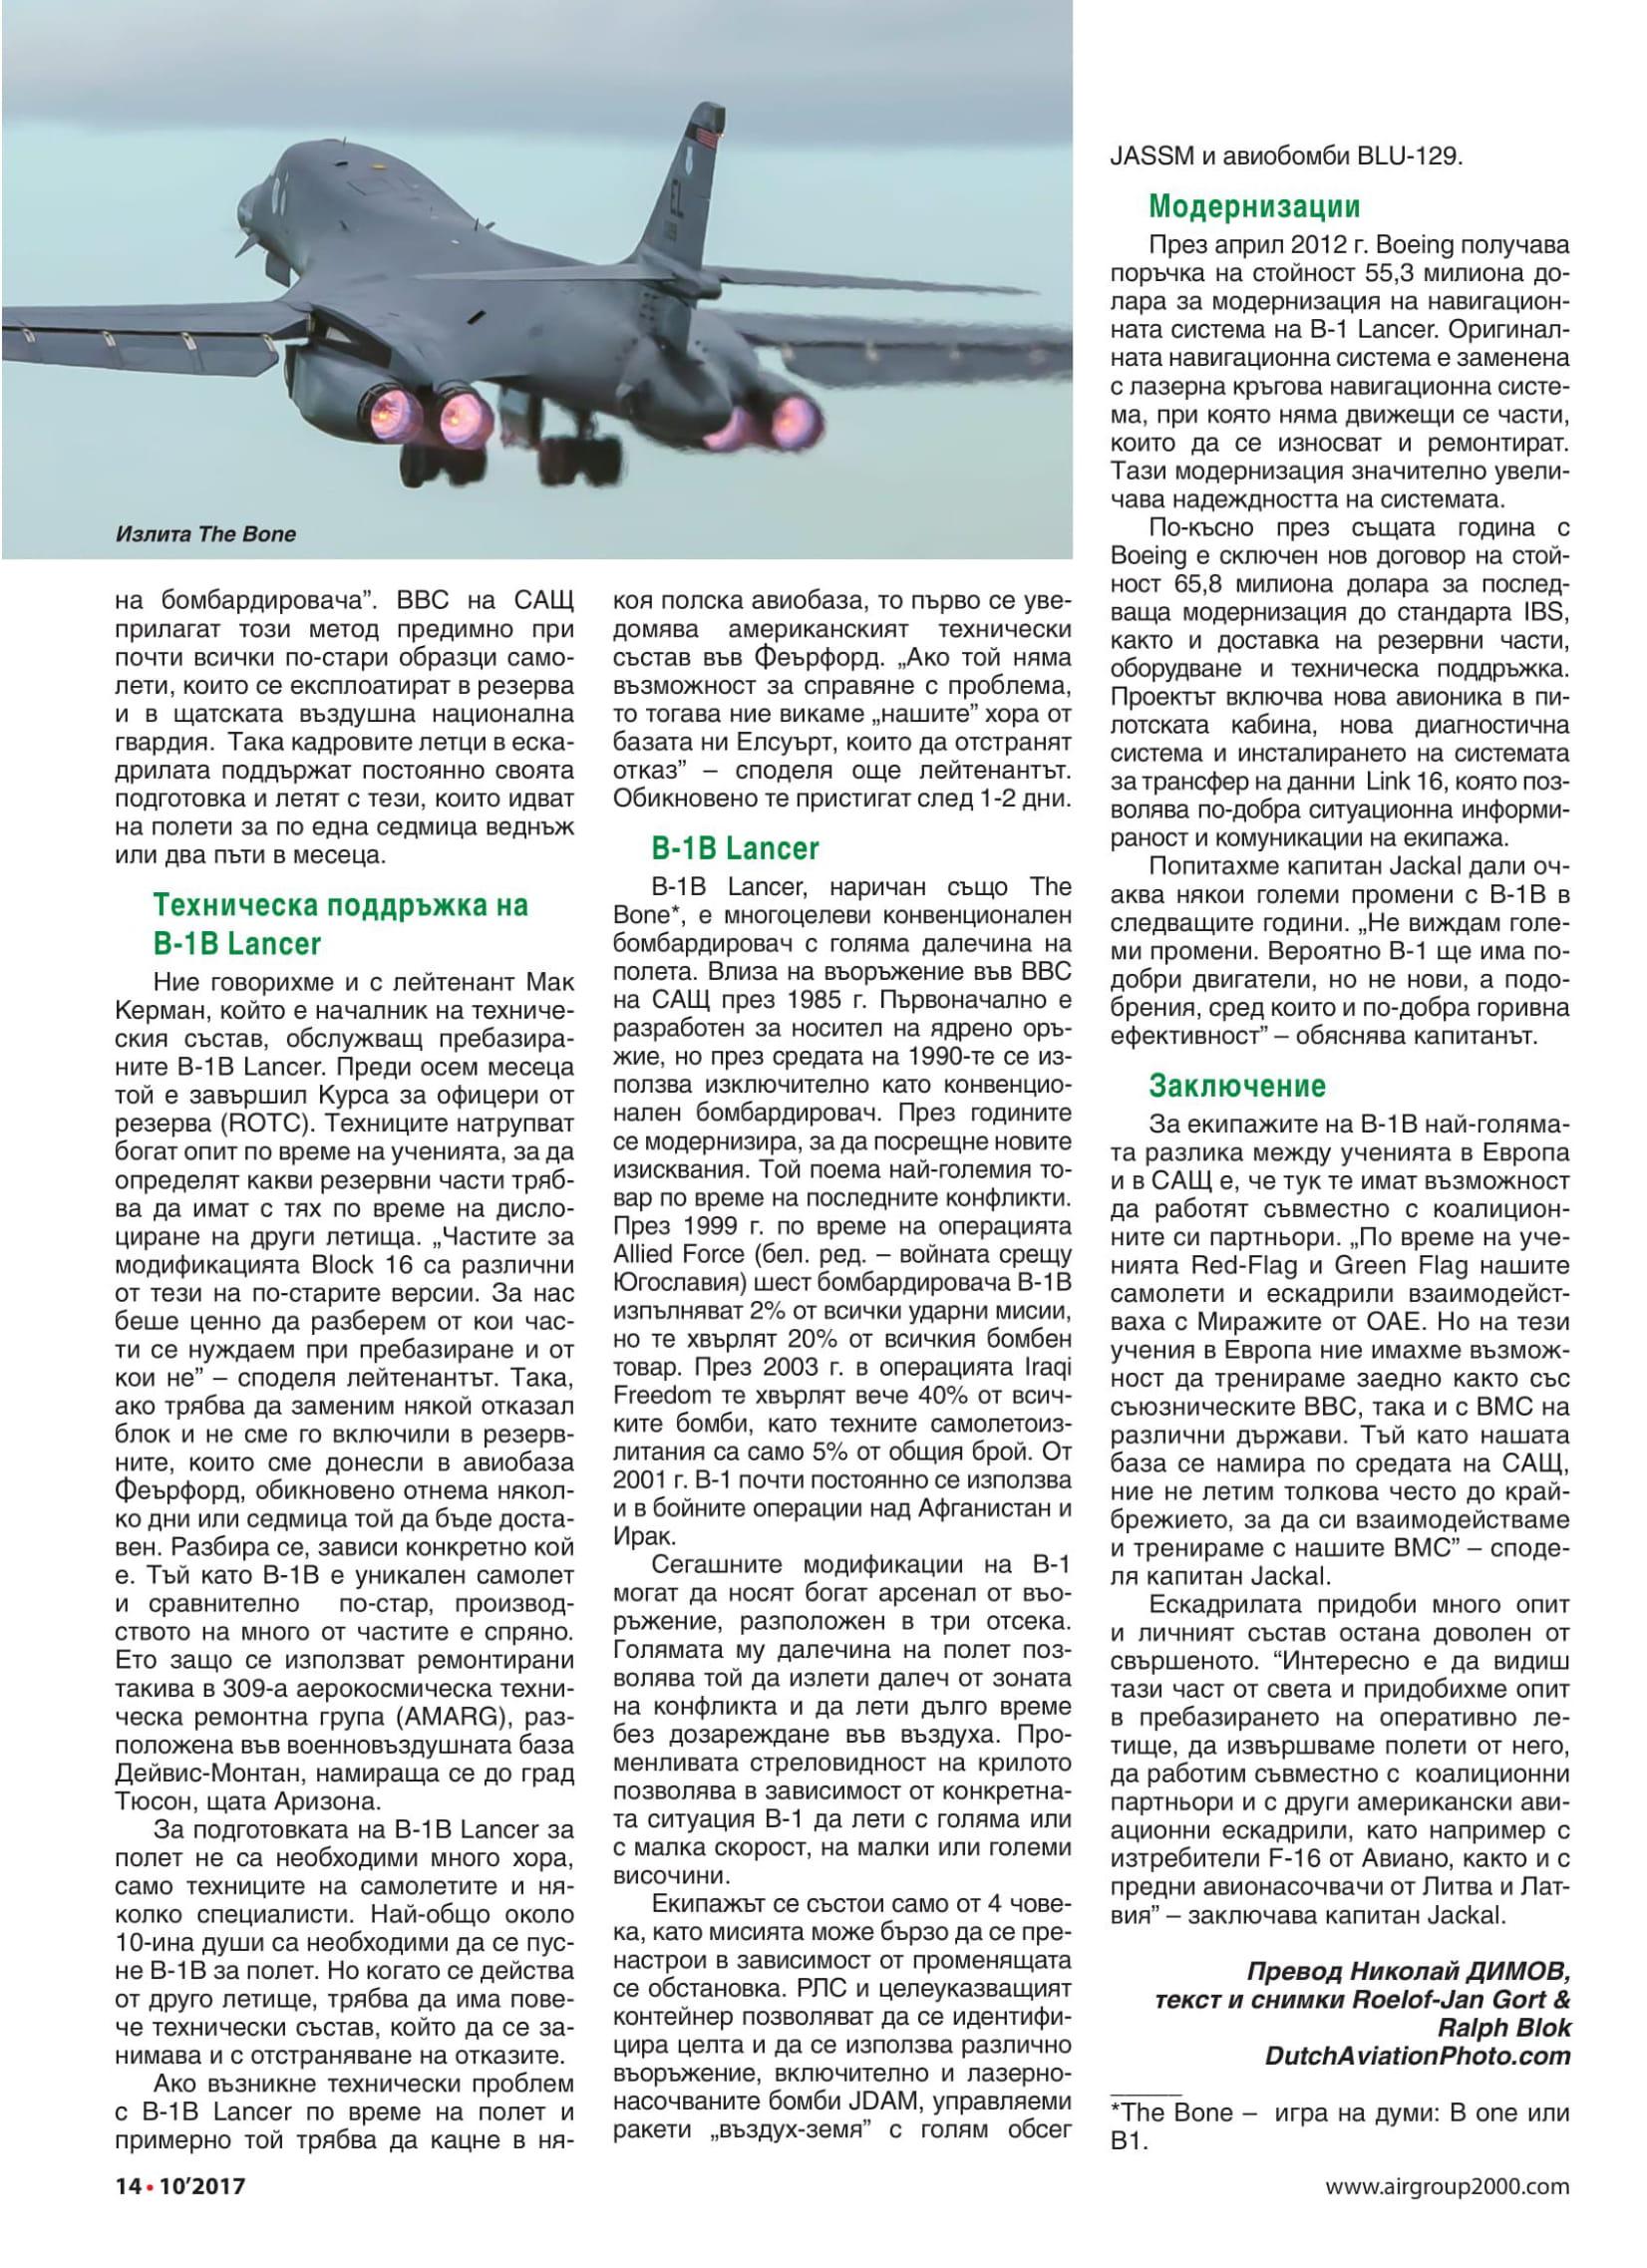 Club Wings (Bulgaria)_Baltops & Saber Strike 2017-4